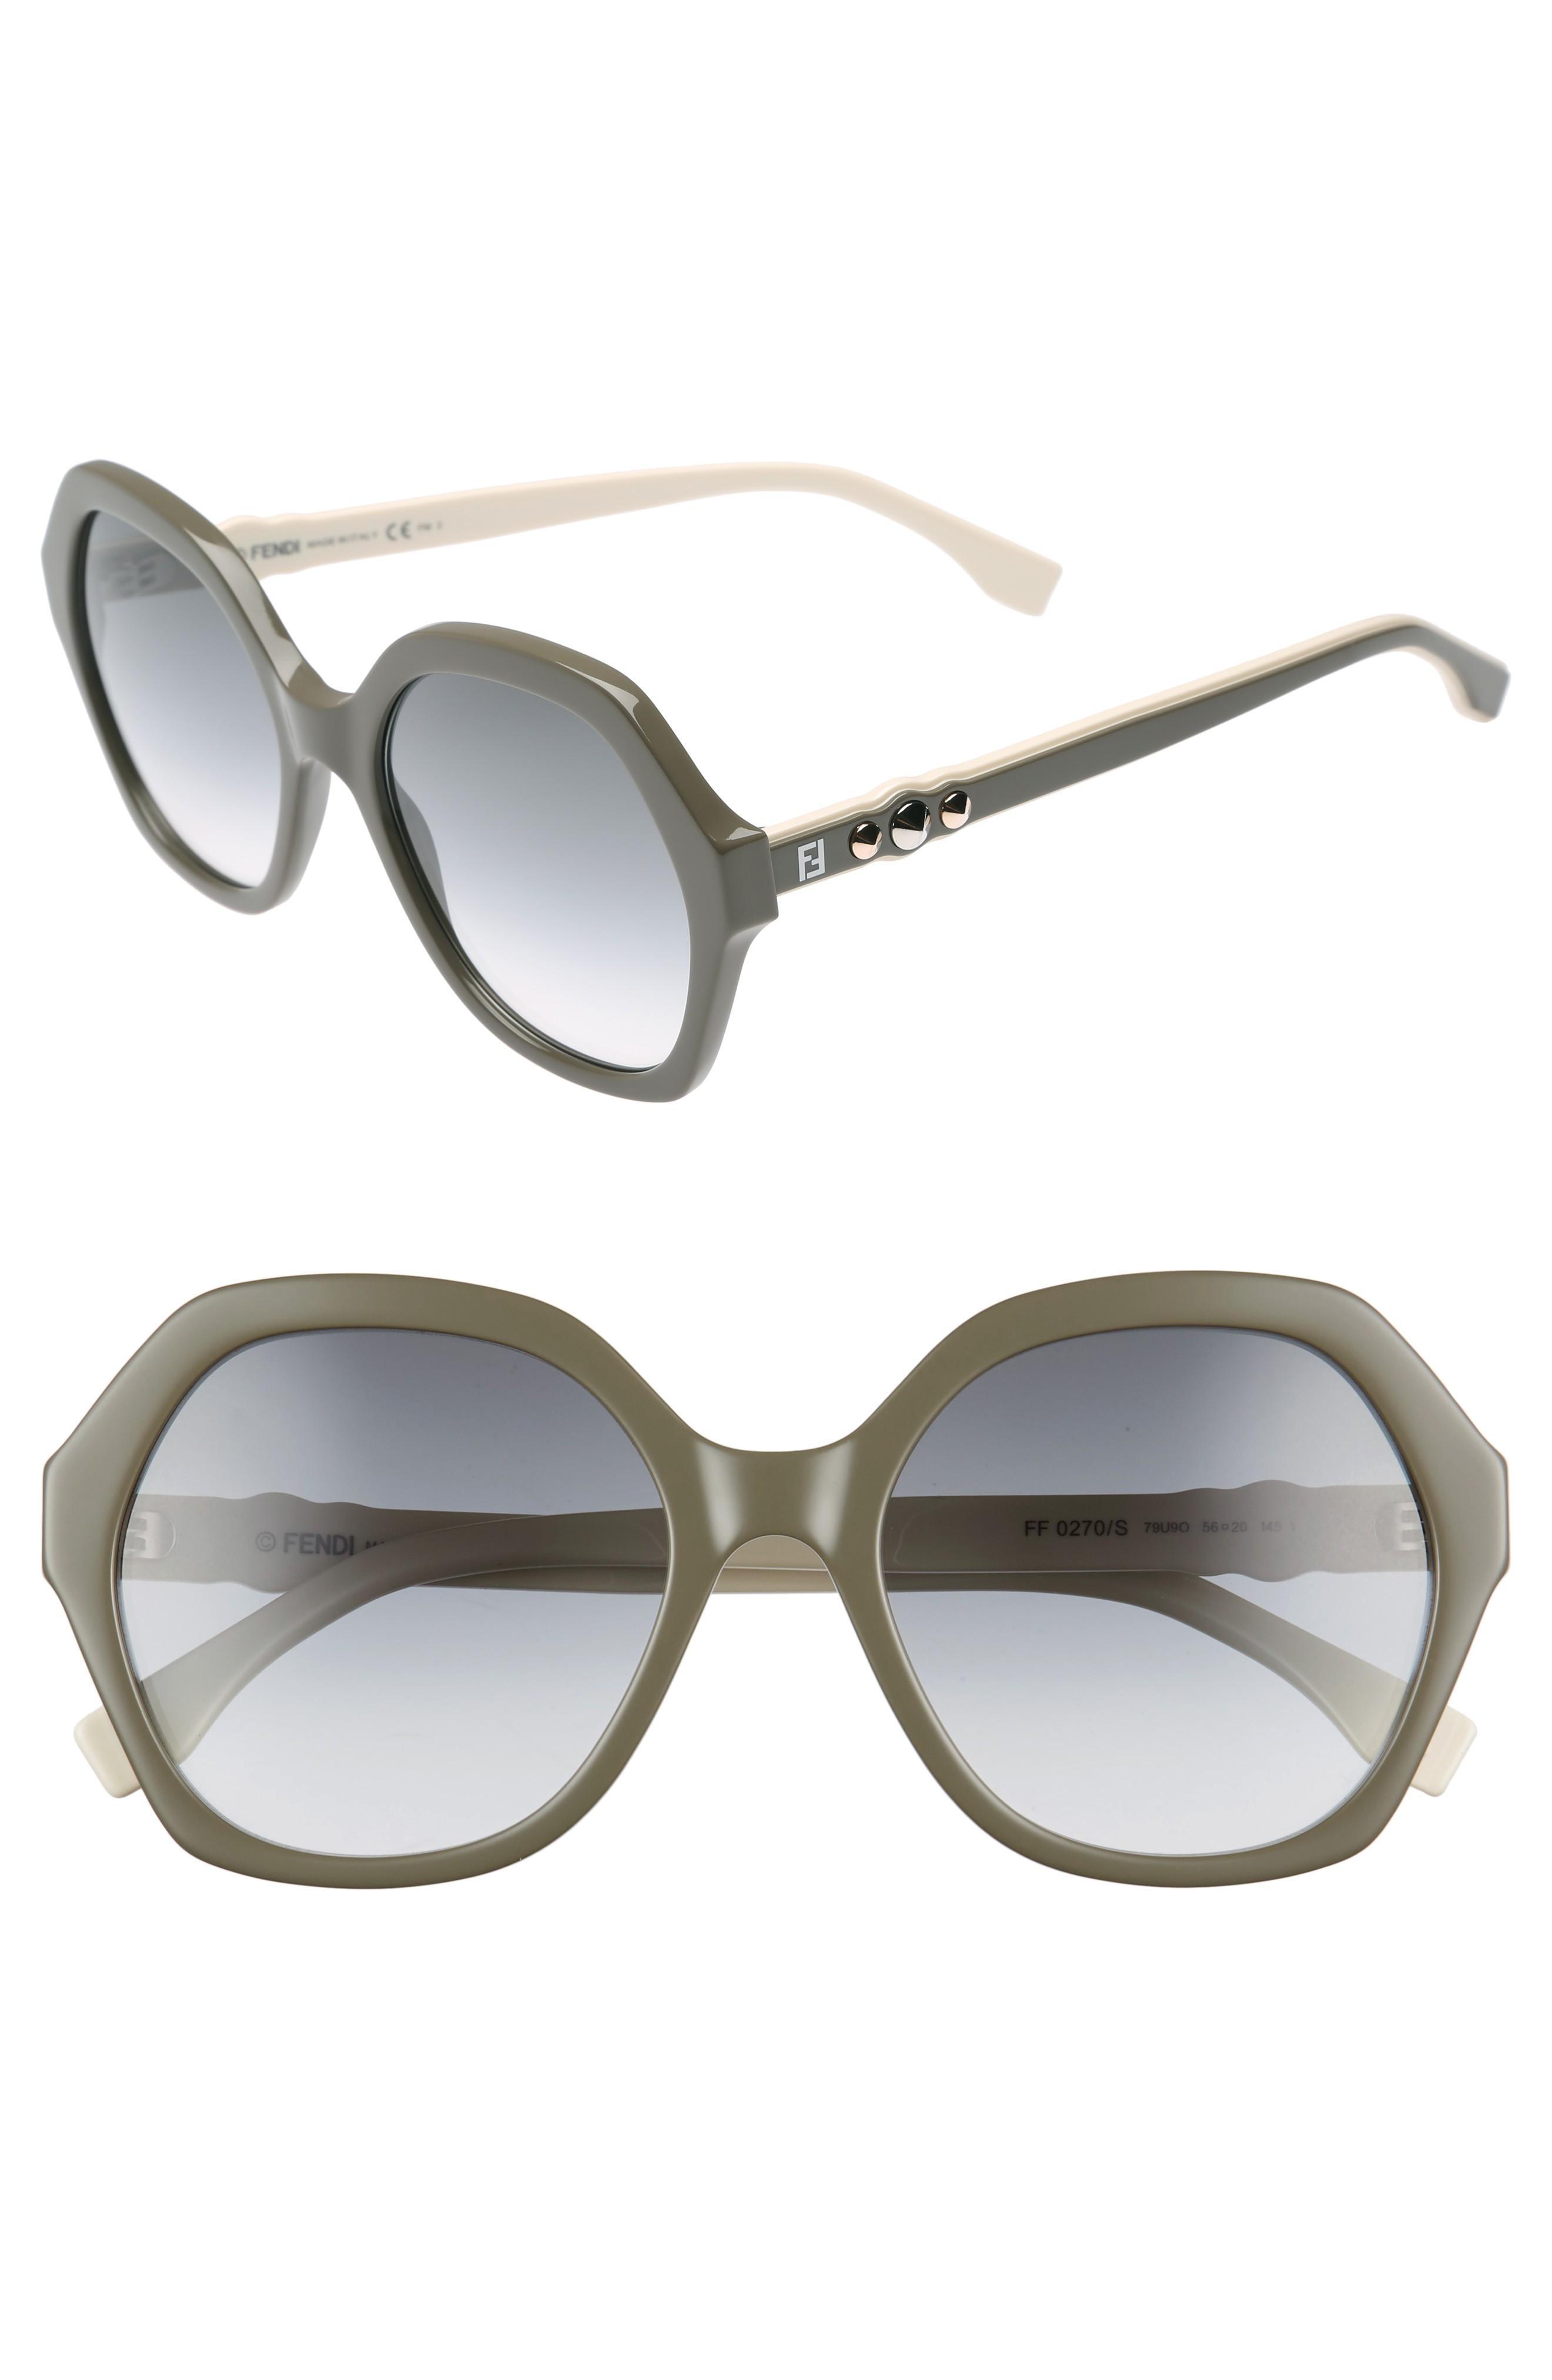 9a2ca580611c Fendi 56Mm Oversize Sunglasses - Mud